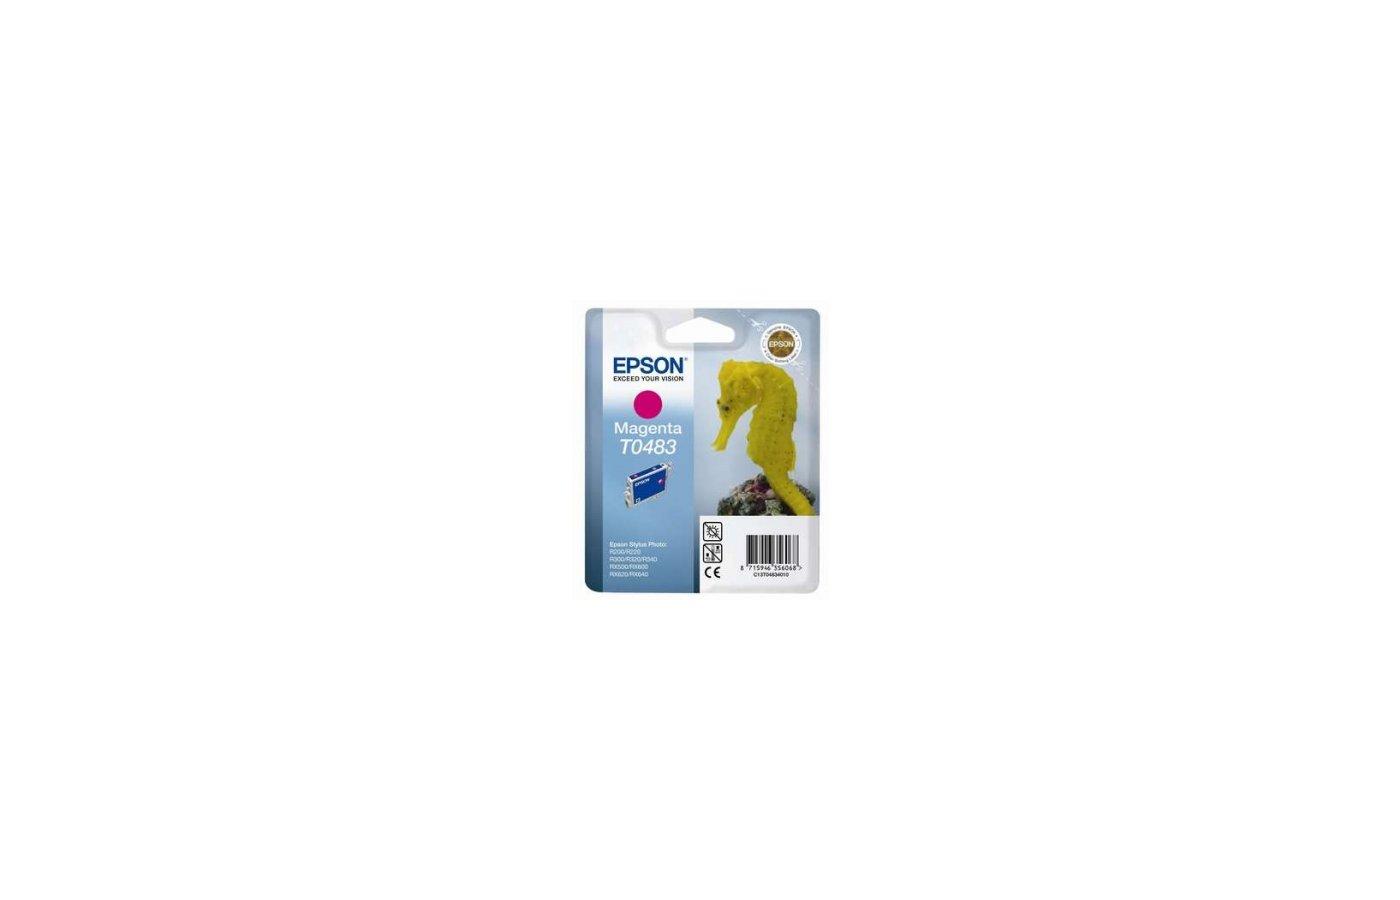 Картридж струйный Epson C13T048340 пурпурный для Stylus Photo R300/RX500